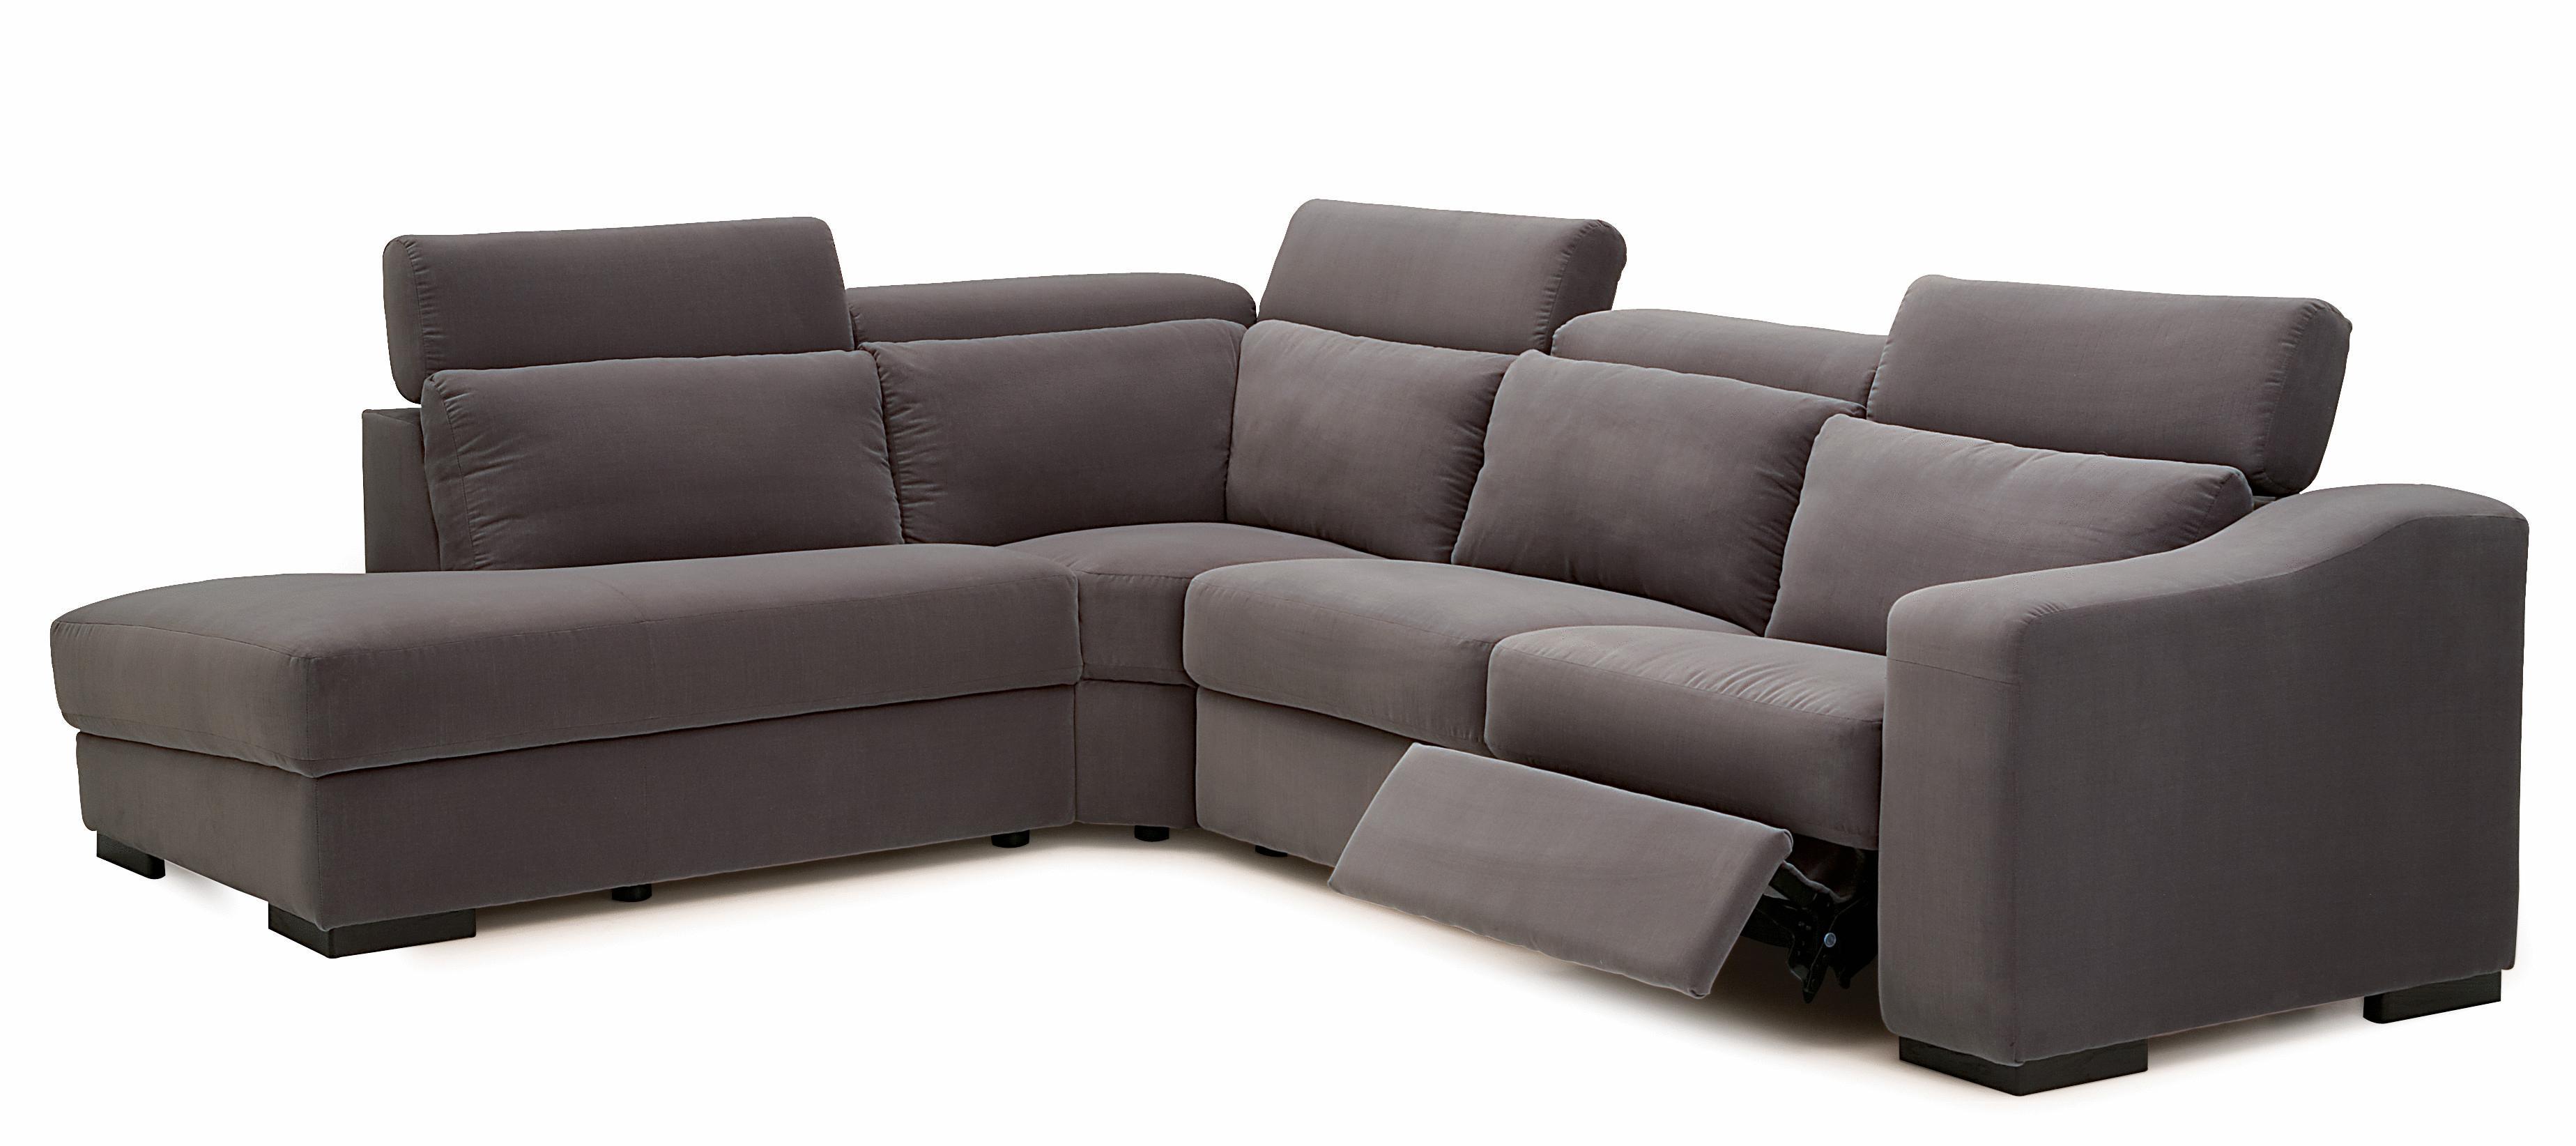 palliser stationary sofas overstock sectional cortez ii left hand facing 4 pc